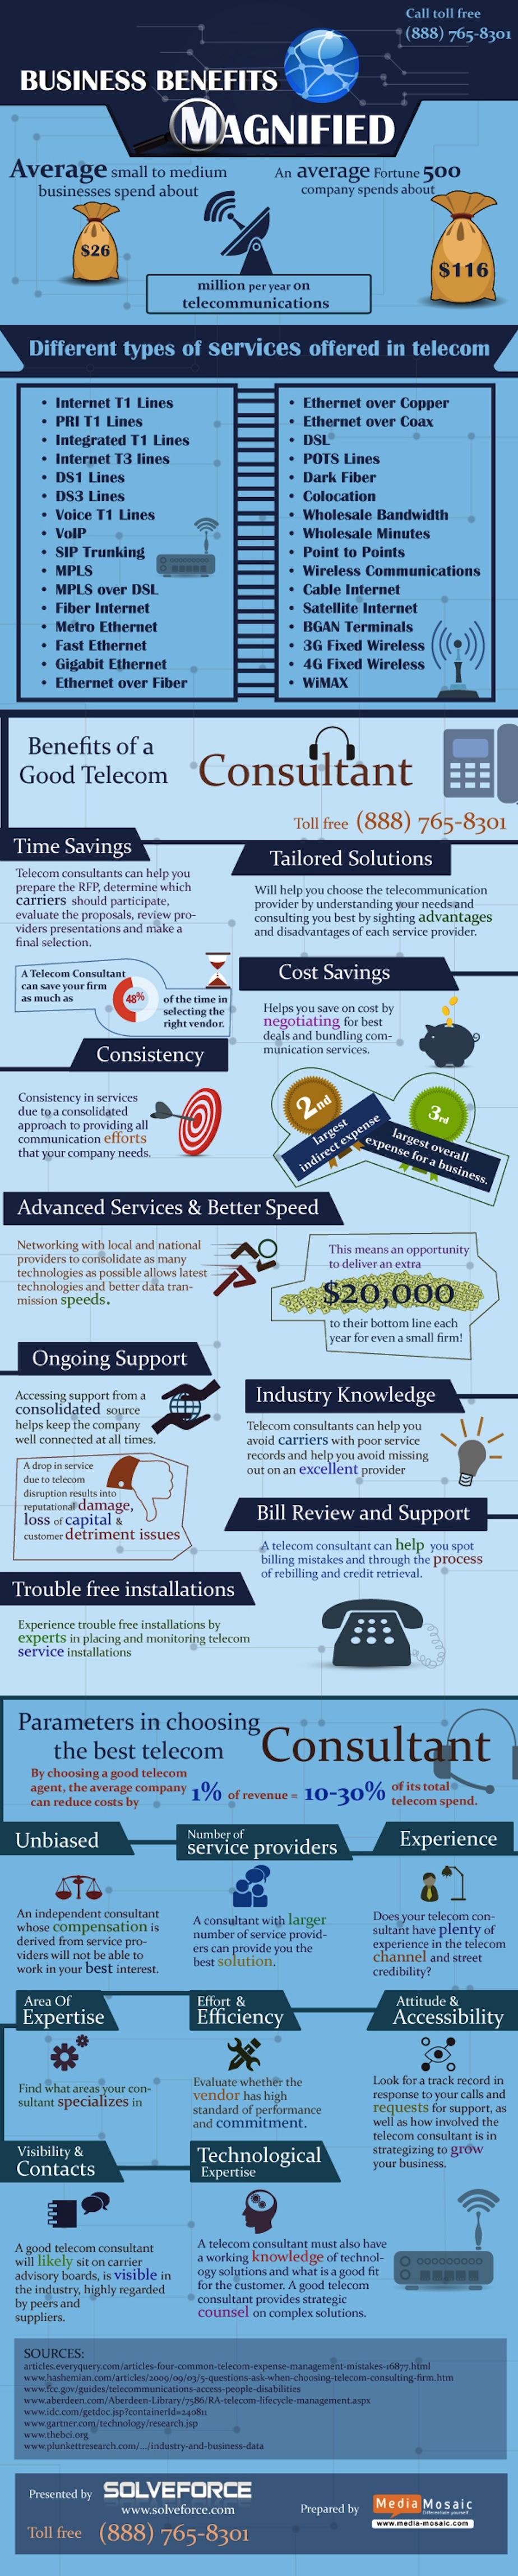 Business  Benefits Magnified Telecommunications